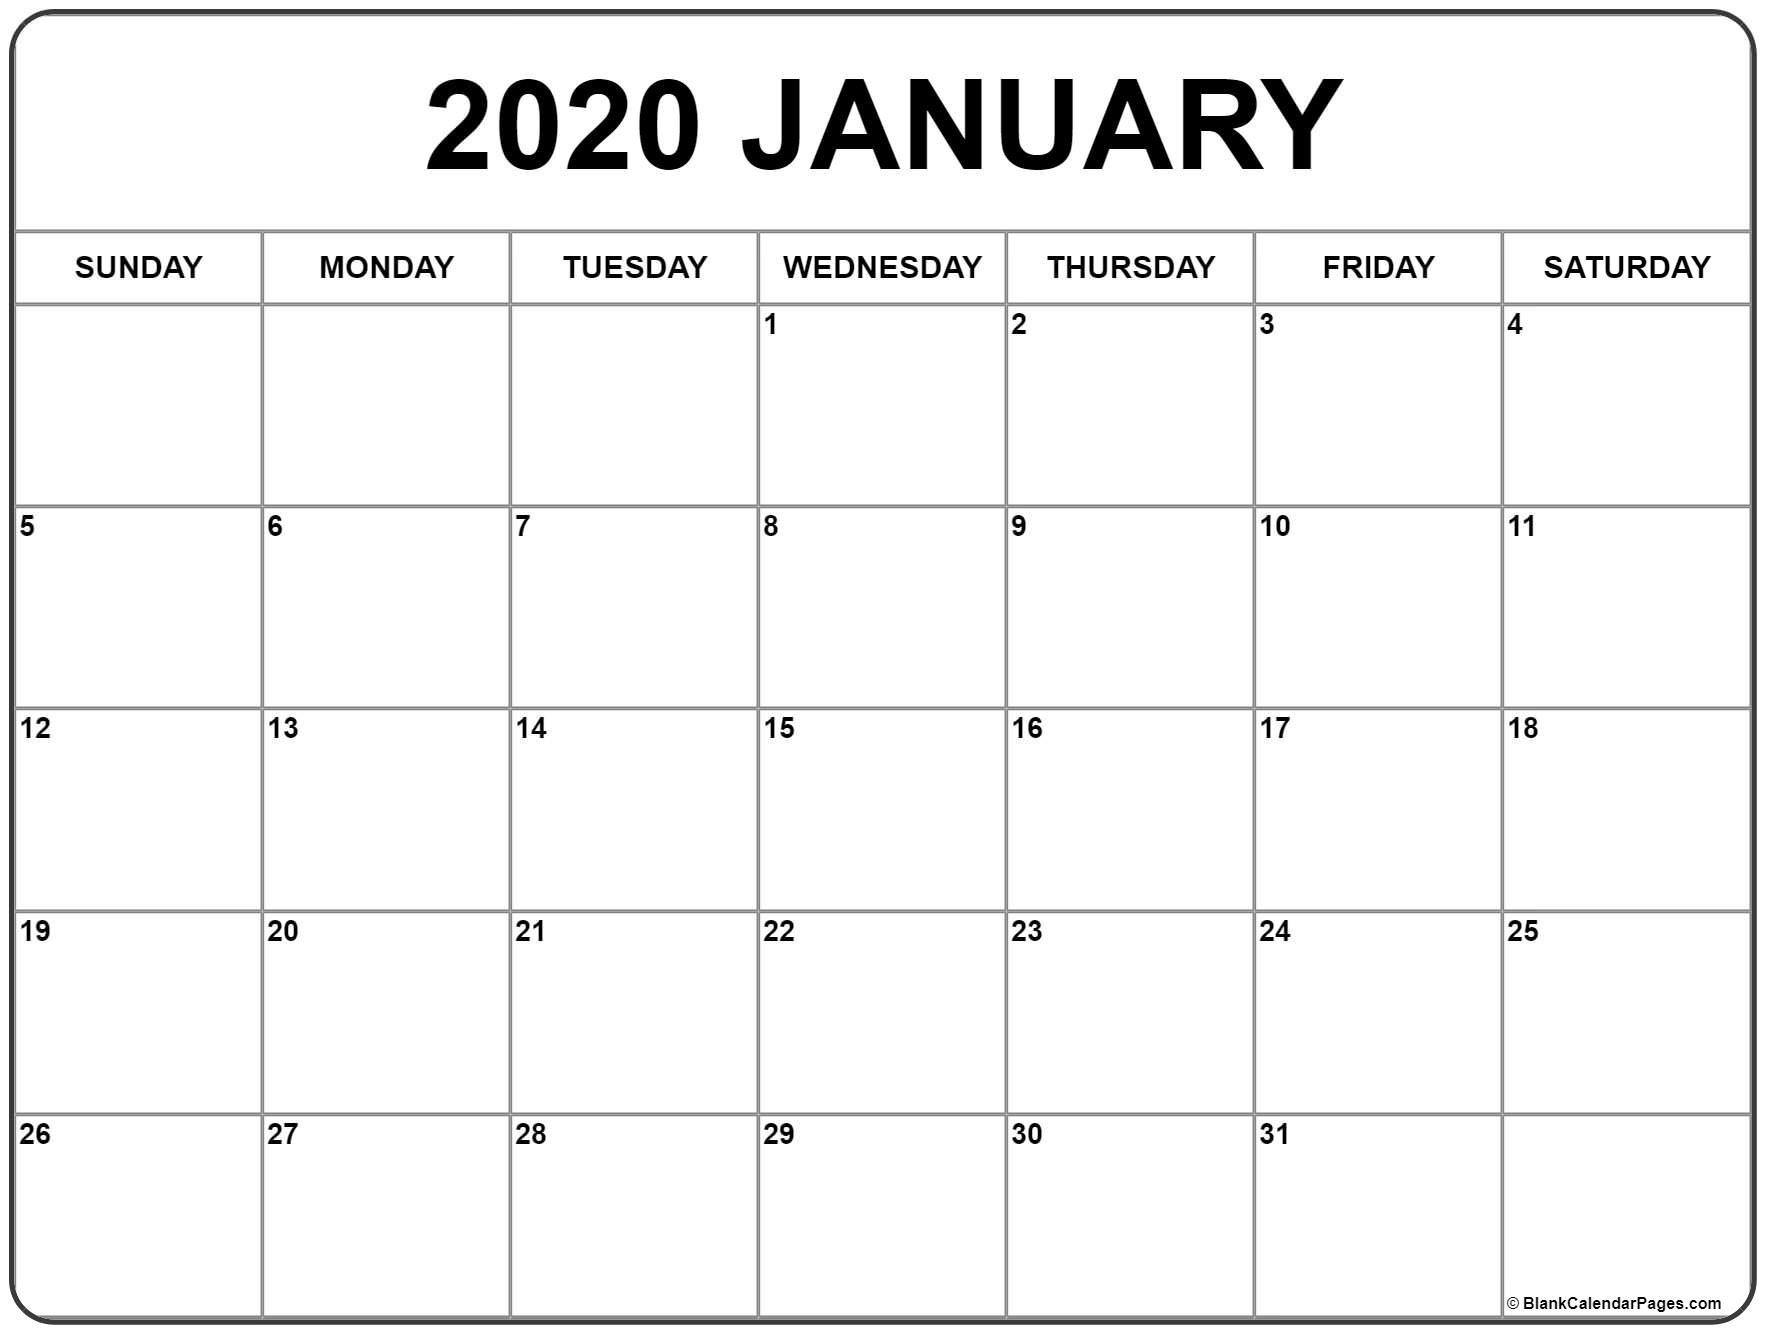 January 2020 Calendar | Free Printable Monthly Calendars-January 2020 Calendar Monday Start